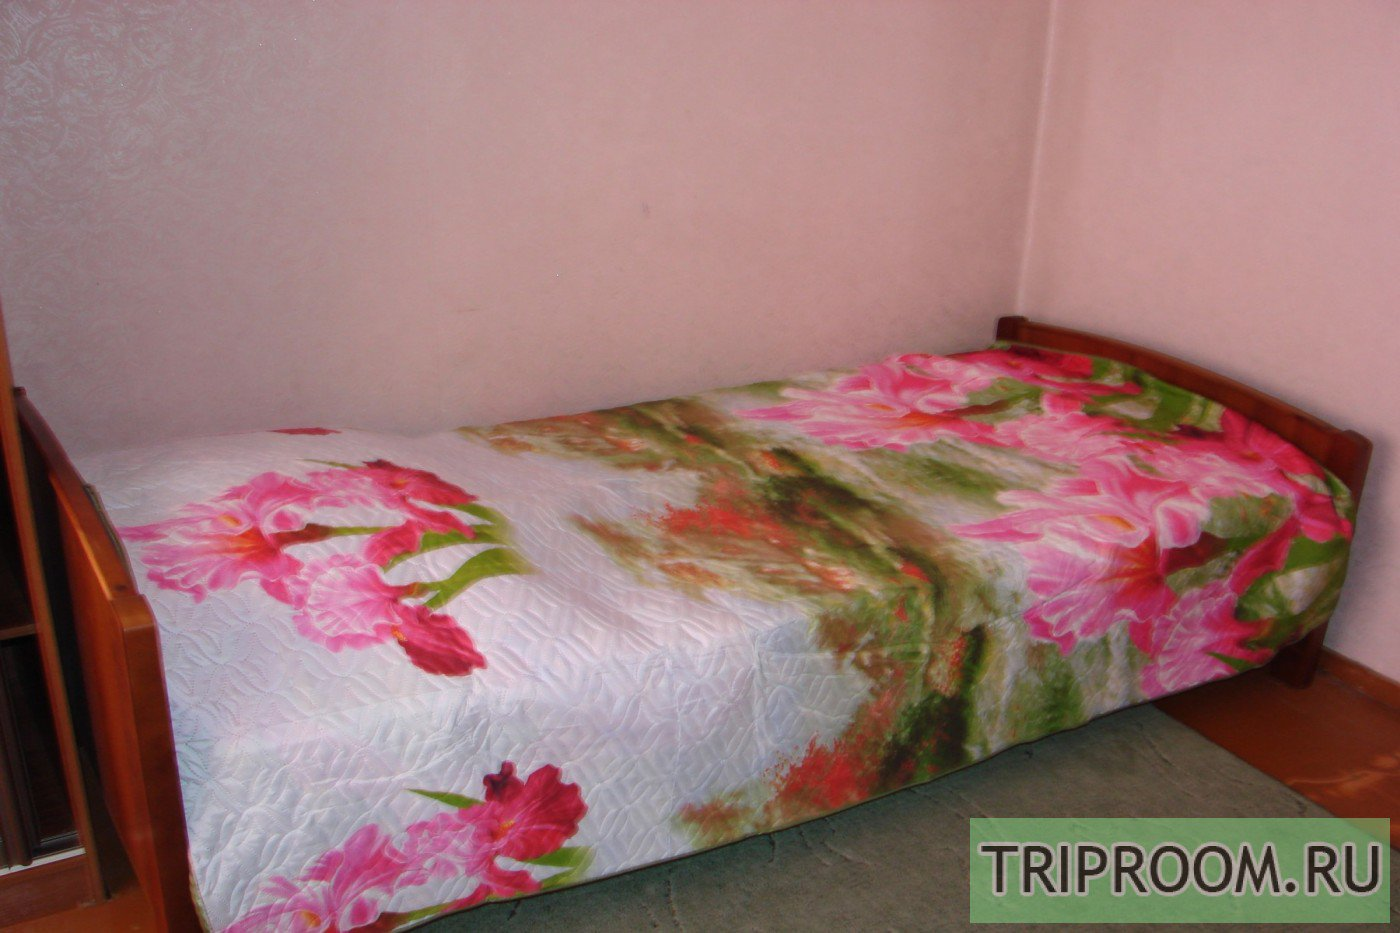 3-комнатная квартира посуточно (вариант № 37250), ул. 9-го Мая улица, фото № 2